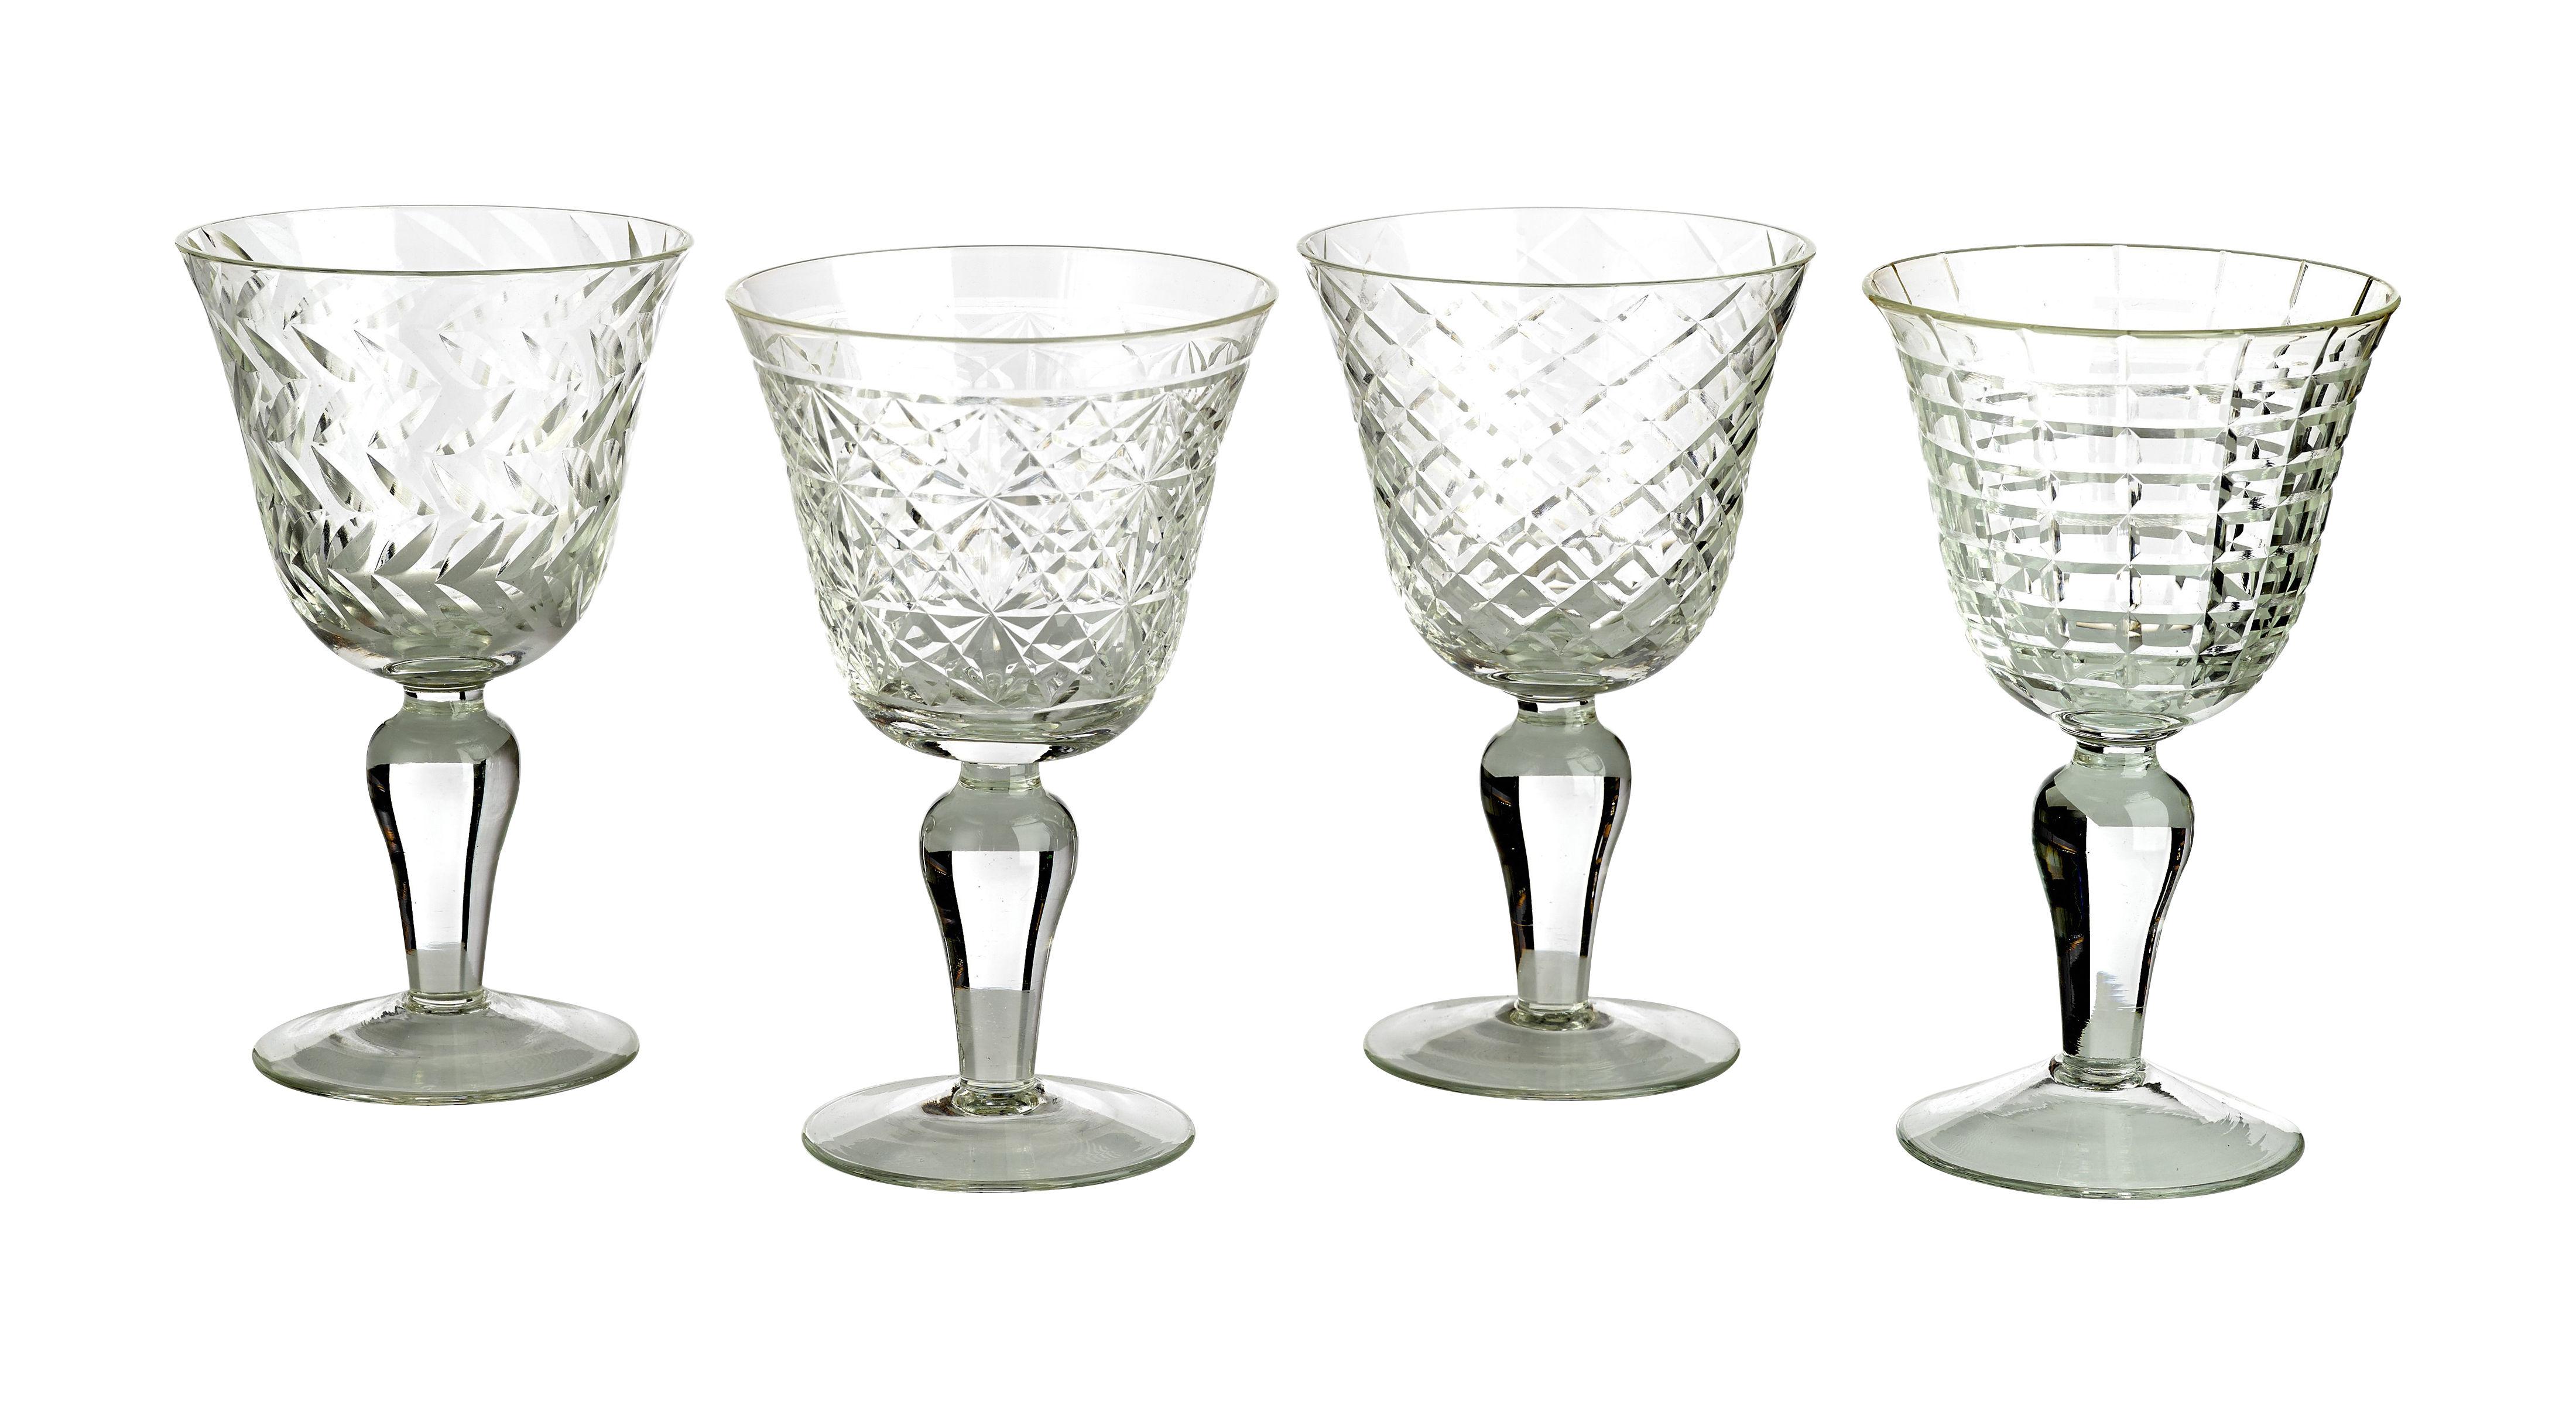 Tavola - Bicchieri  - Bicchiere da vino Cuttings / Set da 4 - Motivi in rilievo - Pols Potten - Trasparente - Verre ciselé